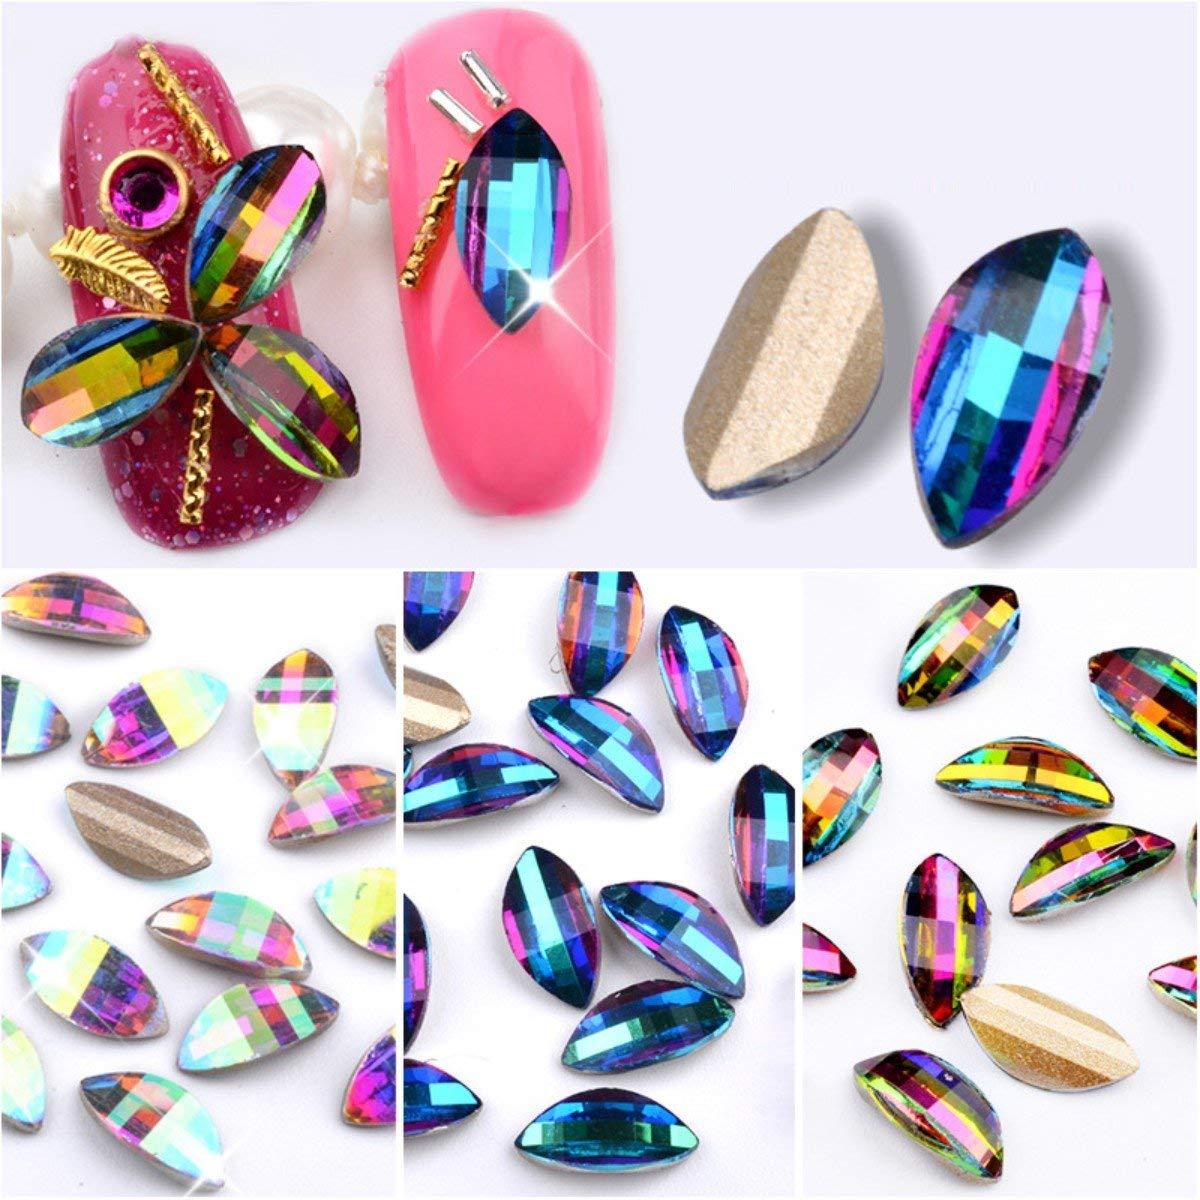 Mezerdoo 30Pcs Charm AB Crystal Leaf Nail Art Rhinestones DIY Symphony Petals Glitter 3d Nail Jewelry Accessories Manicure Decoration Arts (random color)